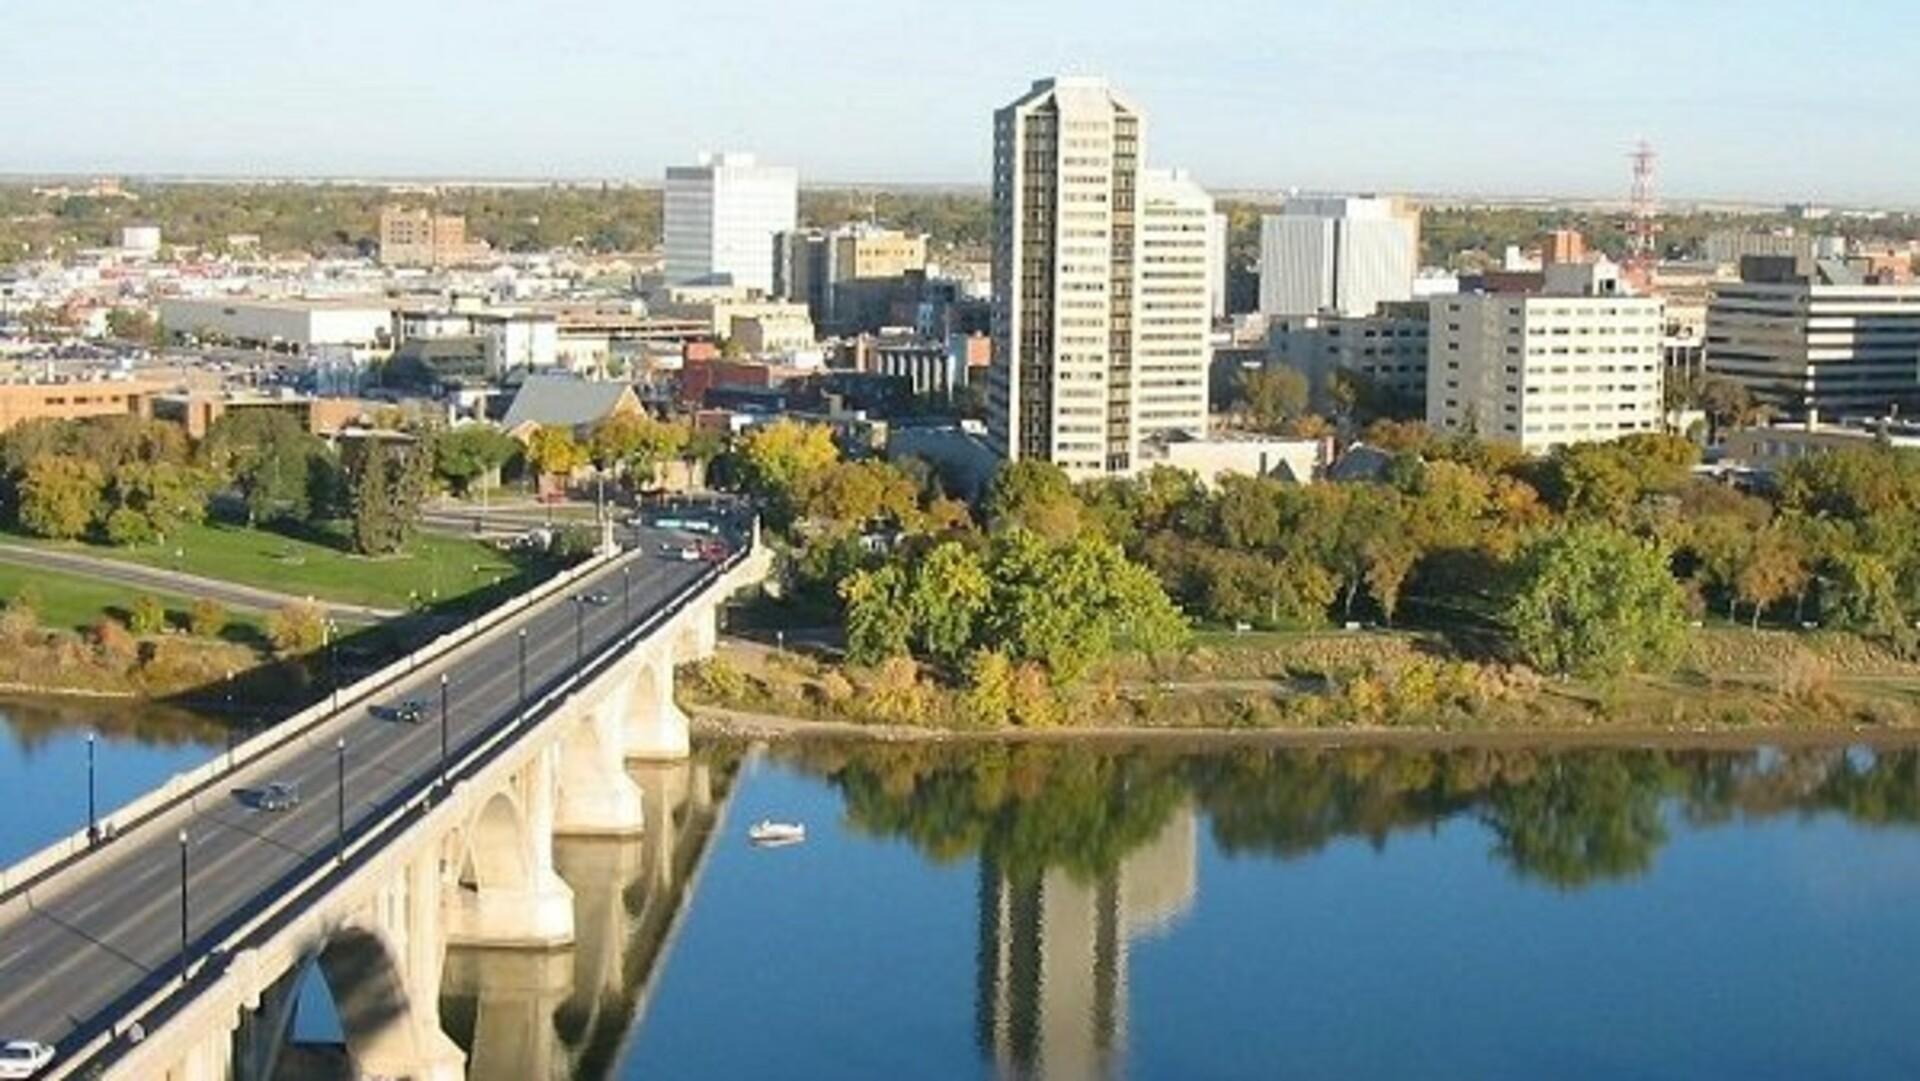 Schüleraustausch Kanada Schuldistrikte Greater Saskatoon ODI